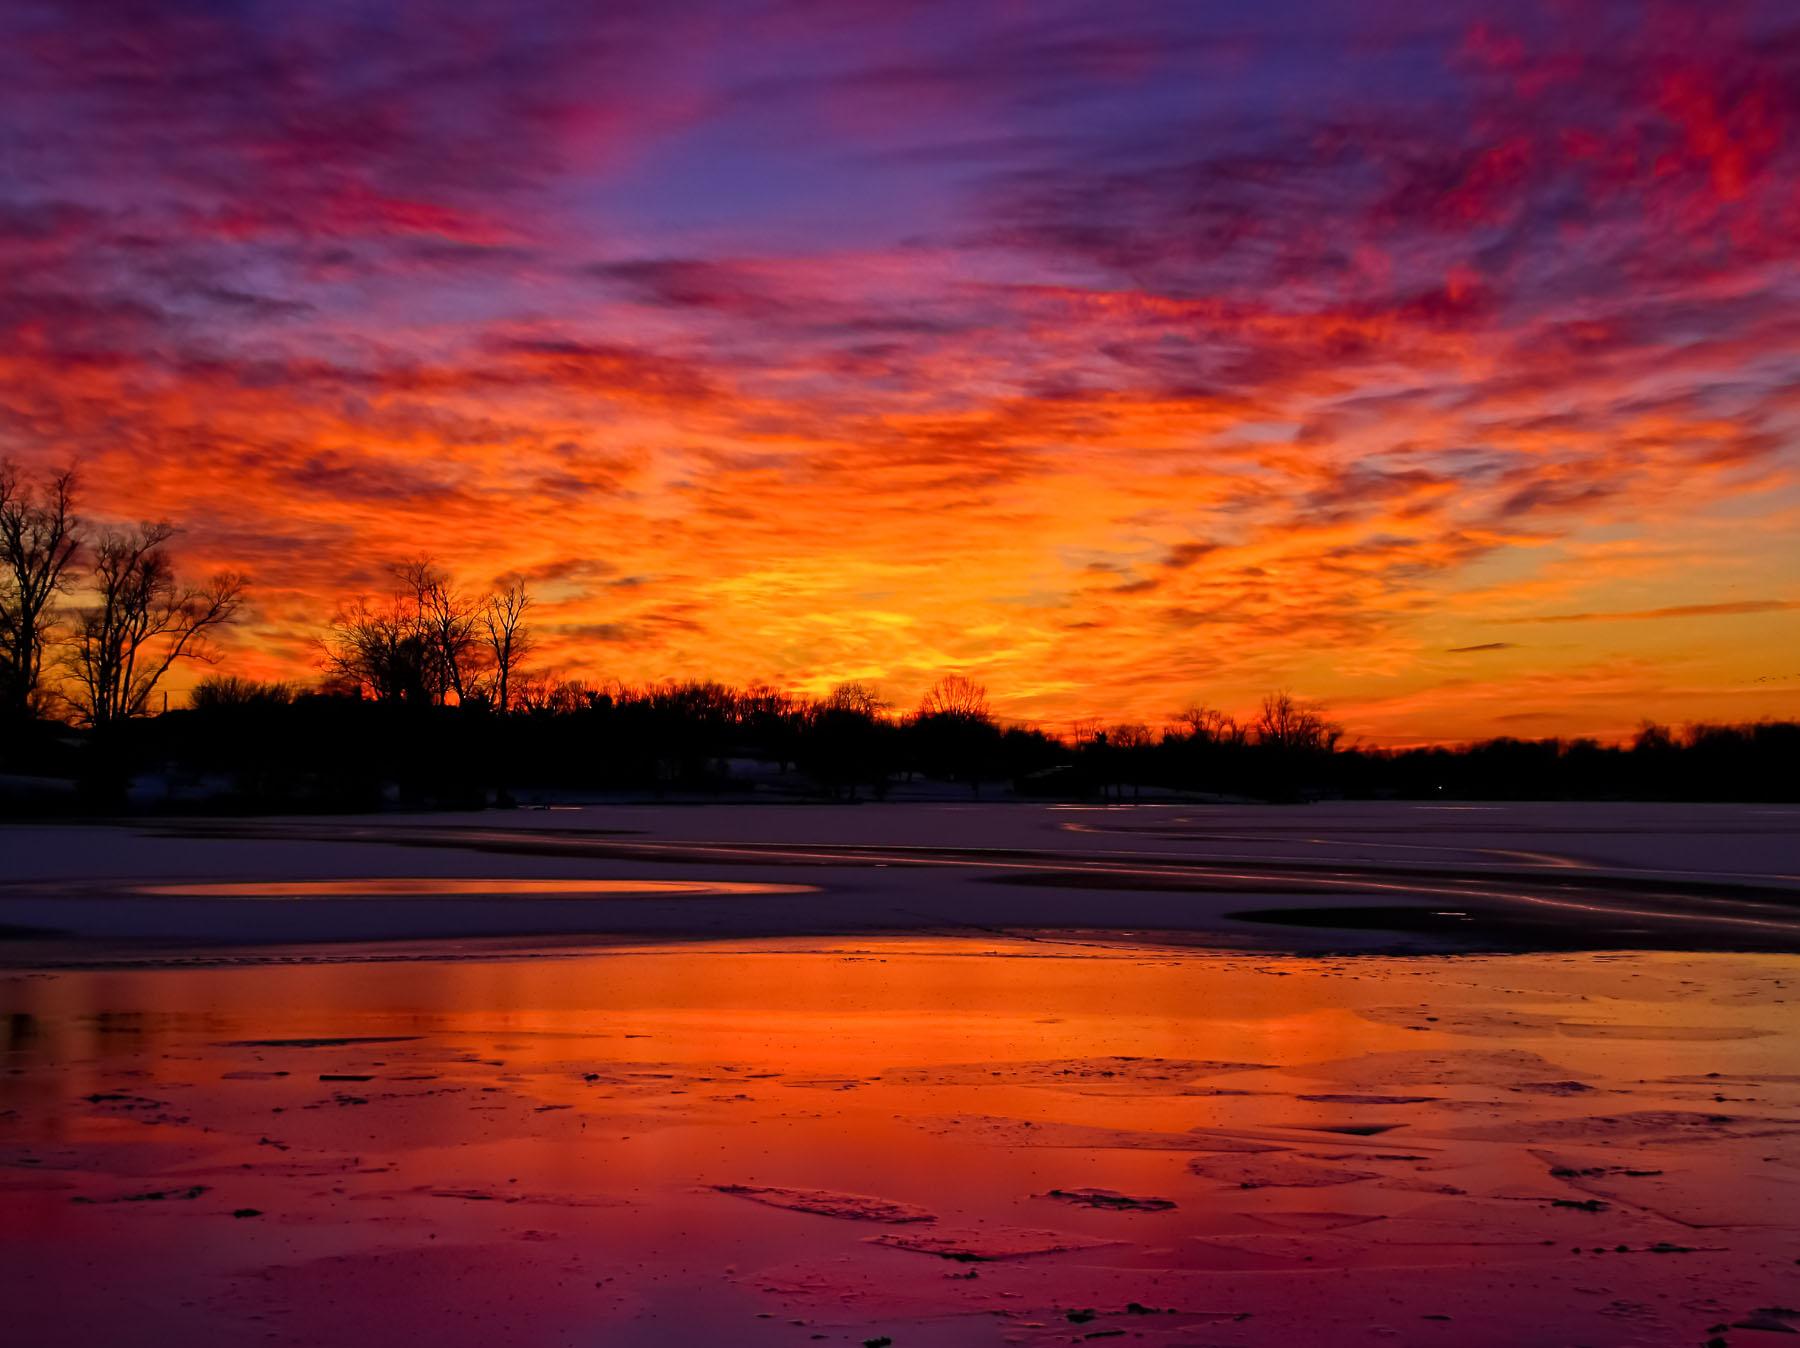 Nature Photography | Sunrise and Sunset Photos | KRanchev Photography